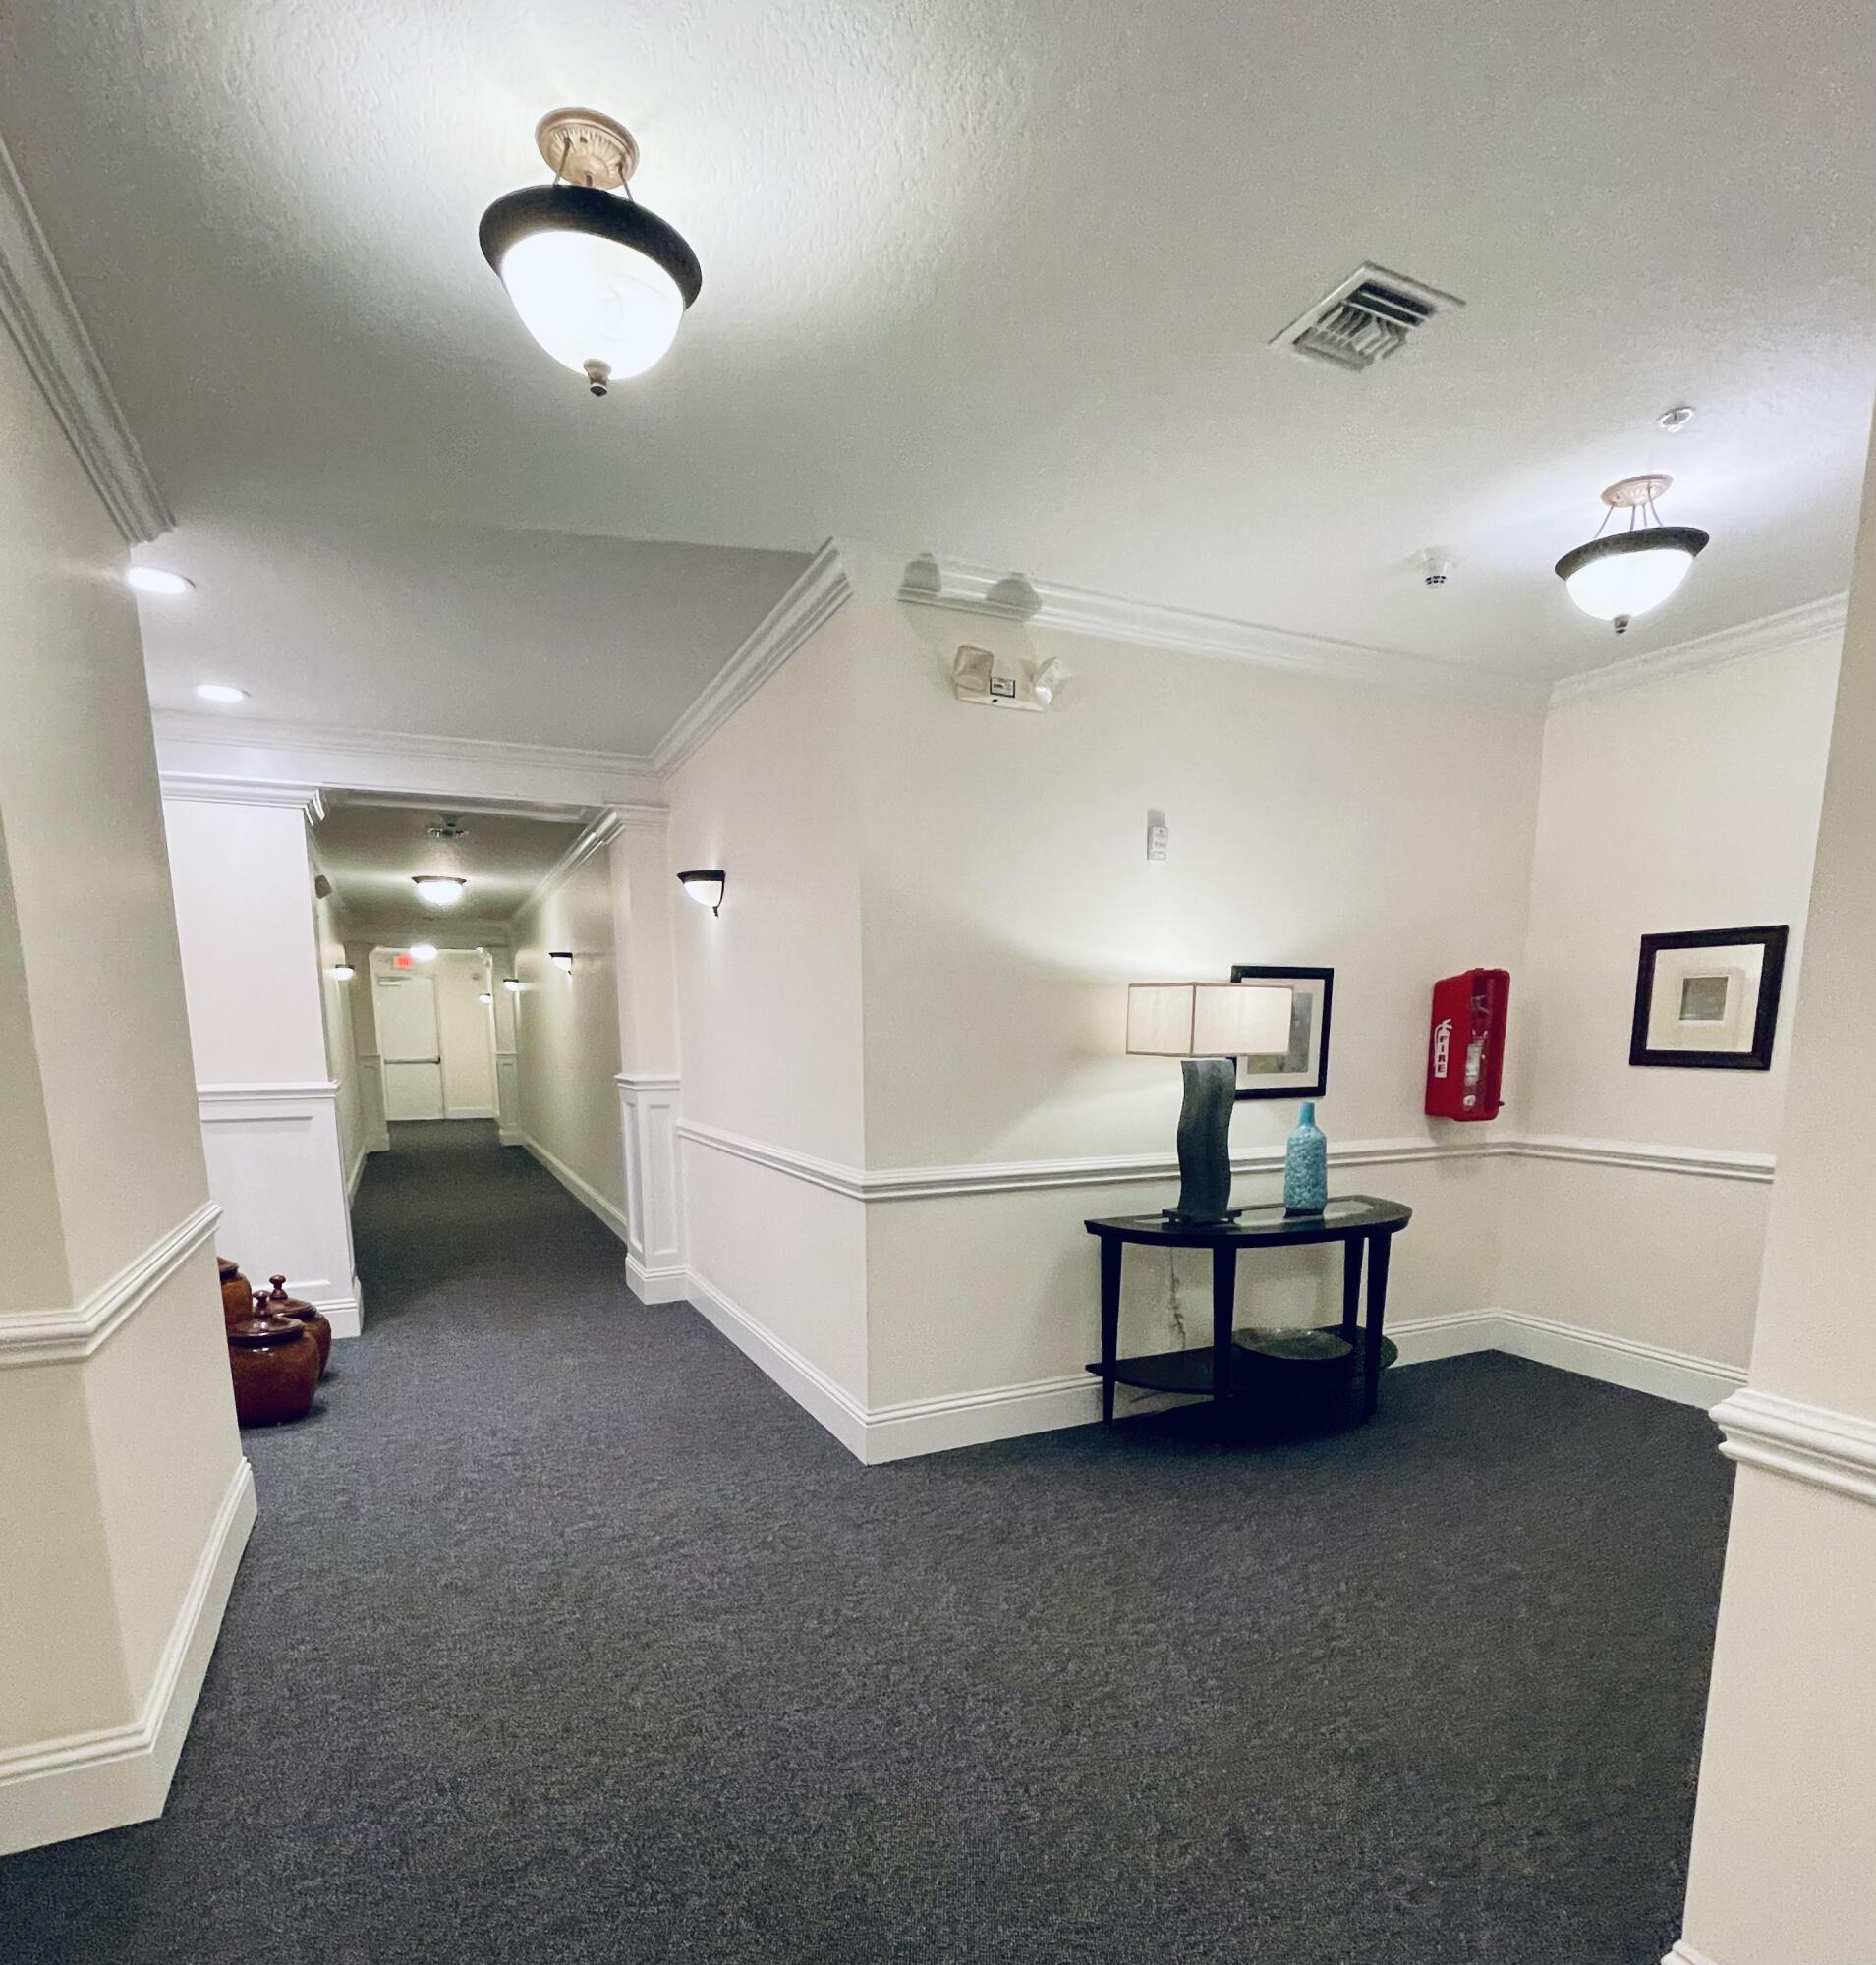 Interior halls